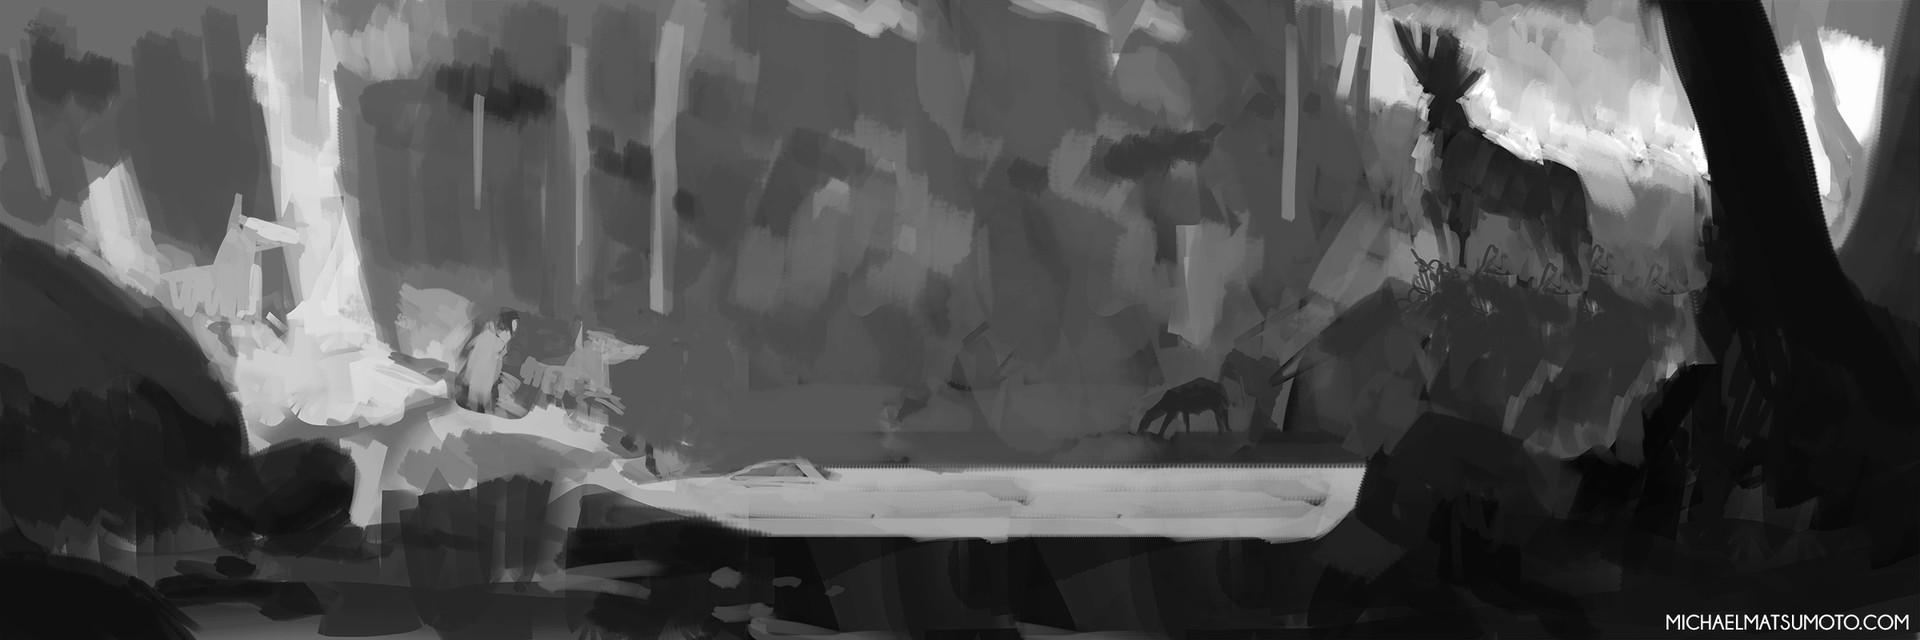 Michael matsumoto forest spirit web sketch